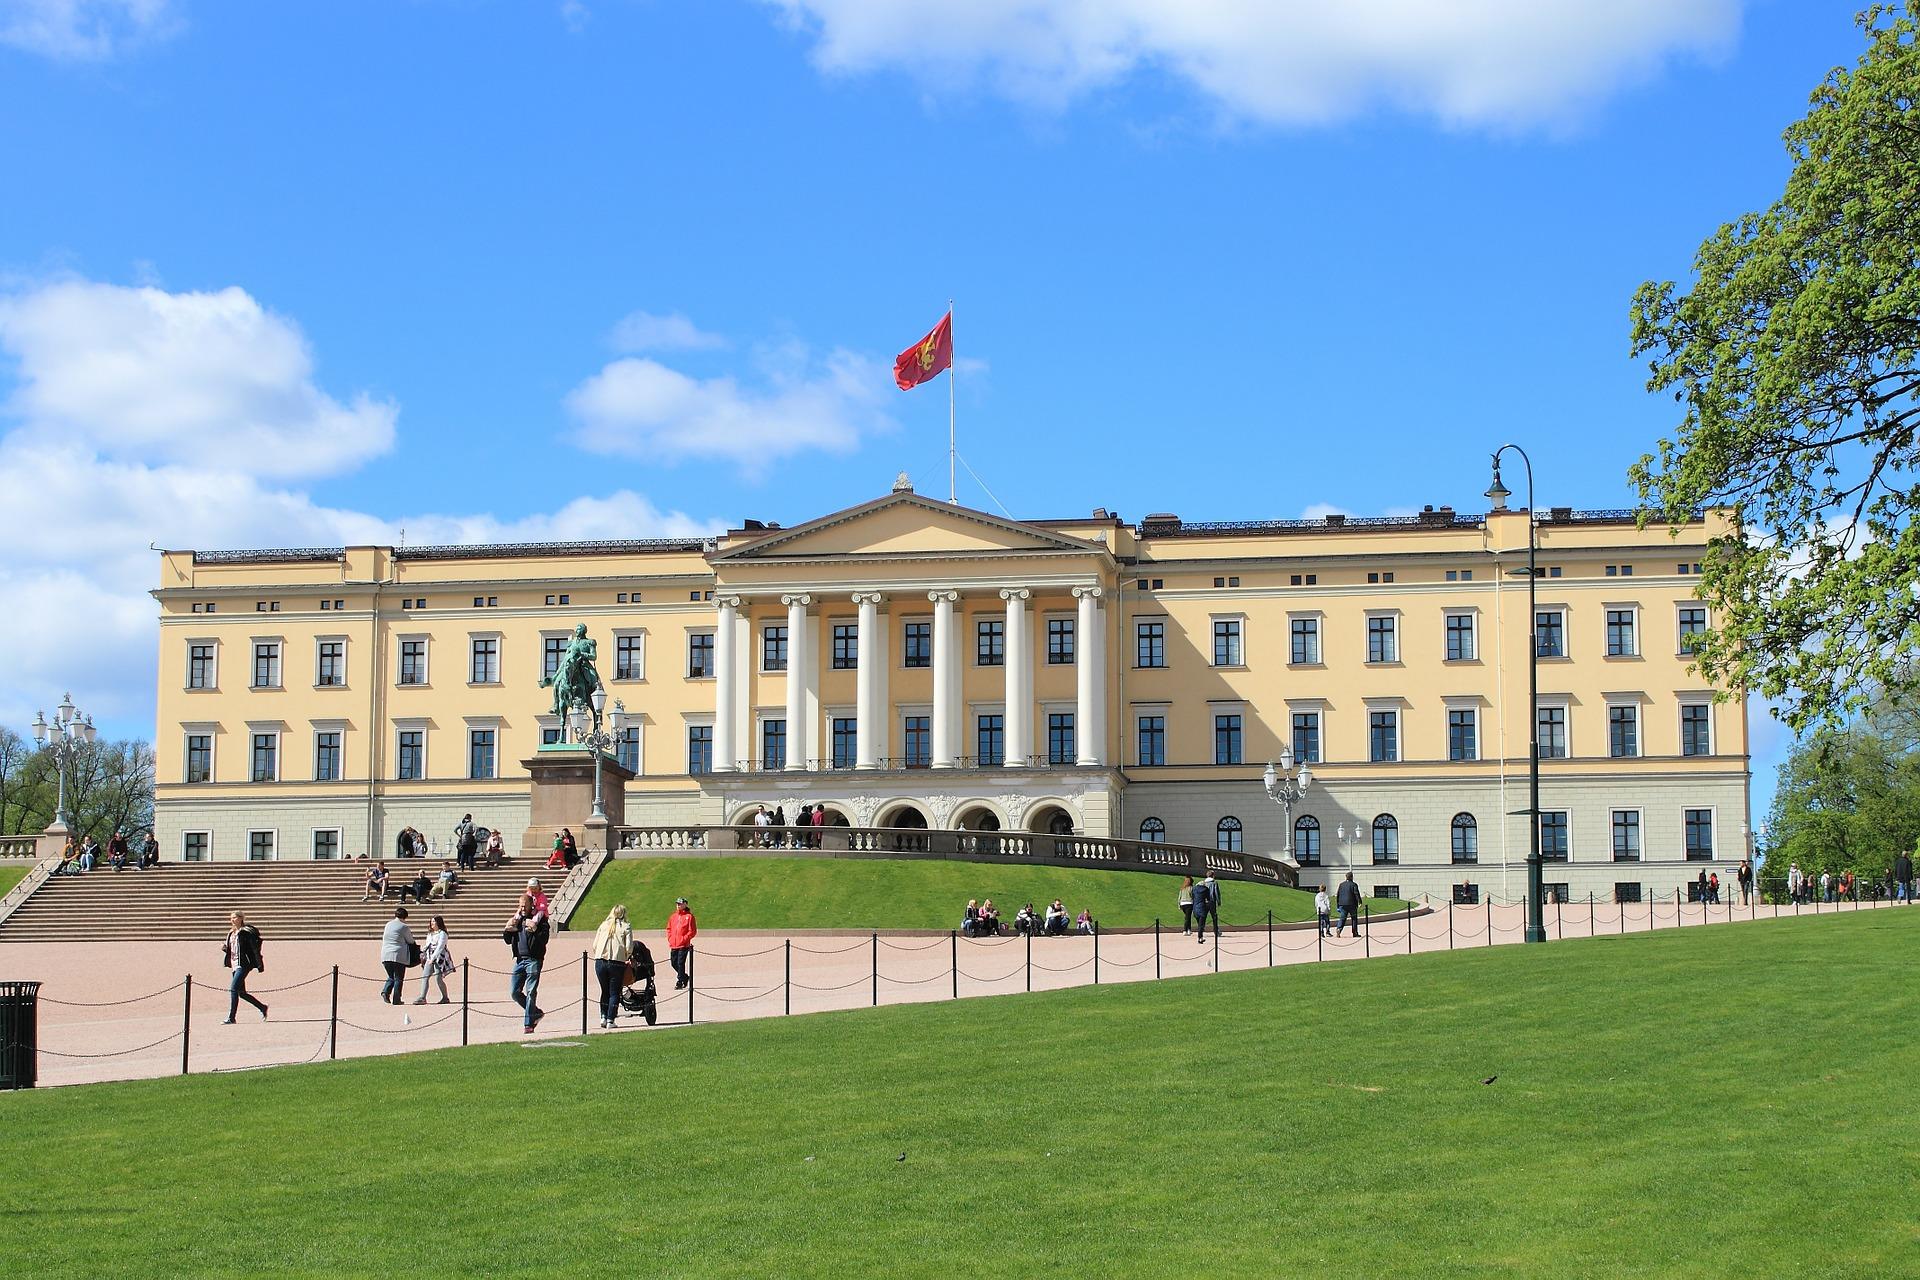 Det kongelige slot Oslo